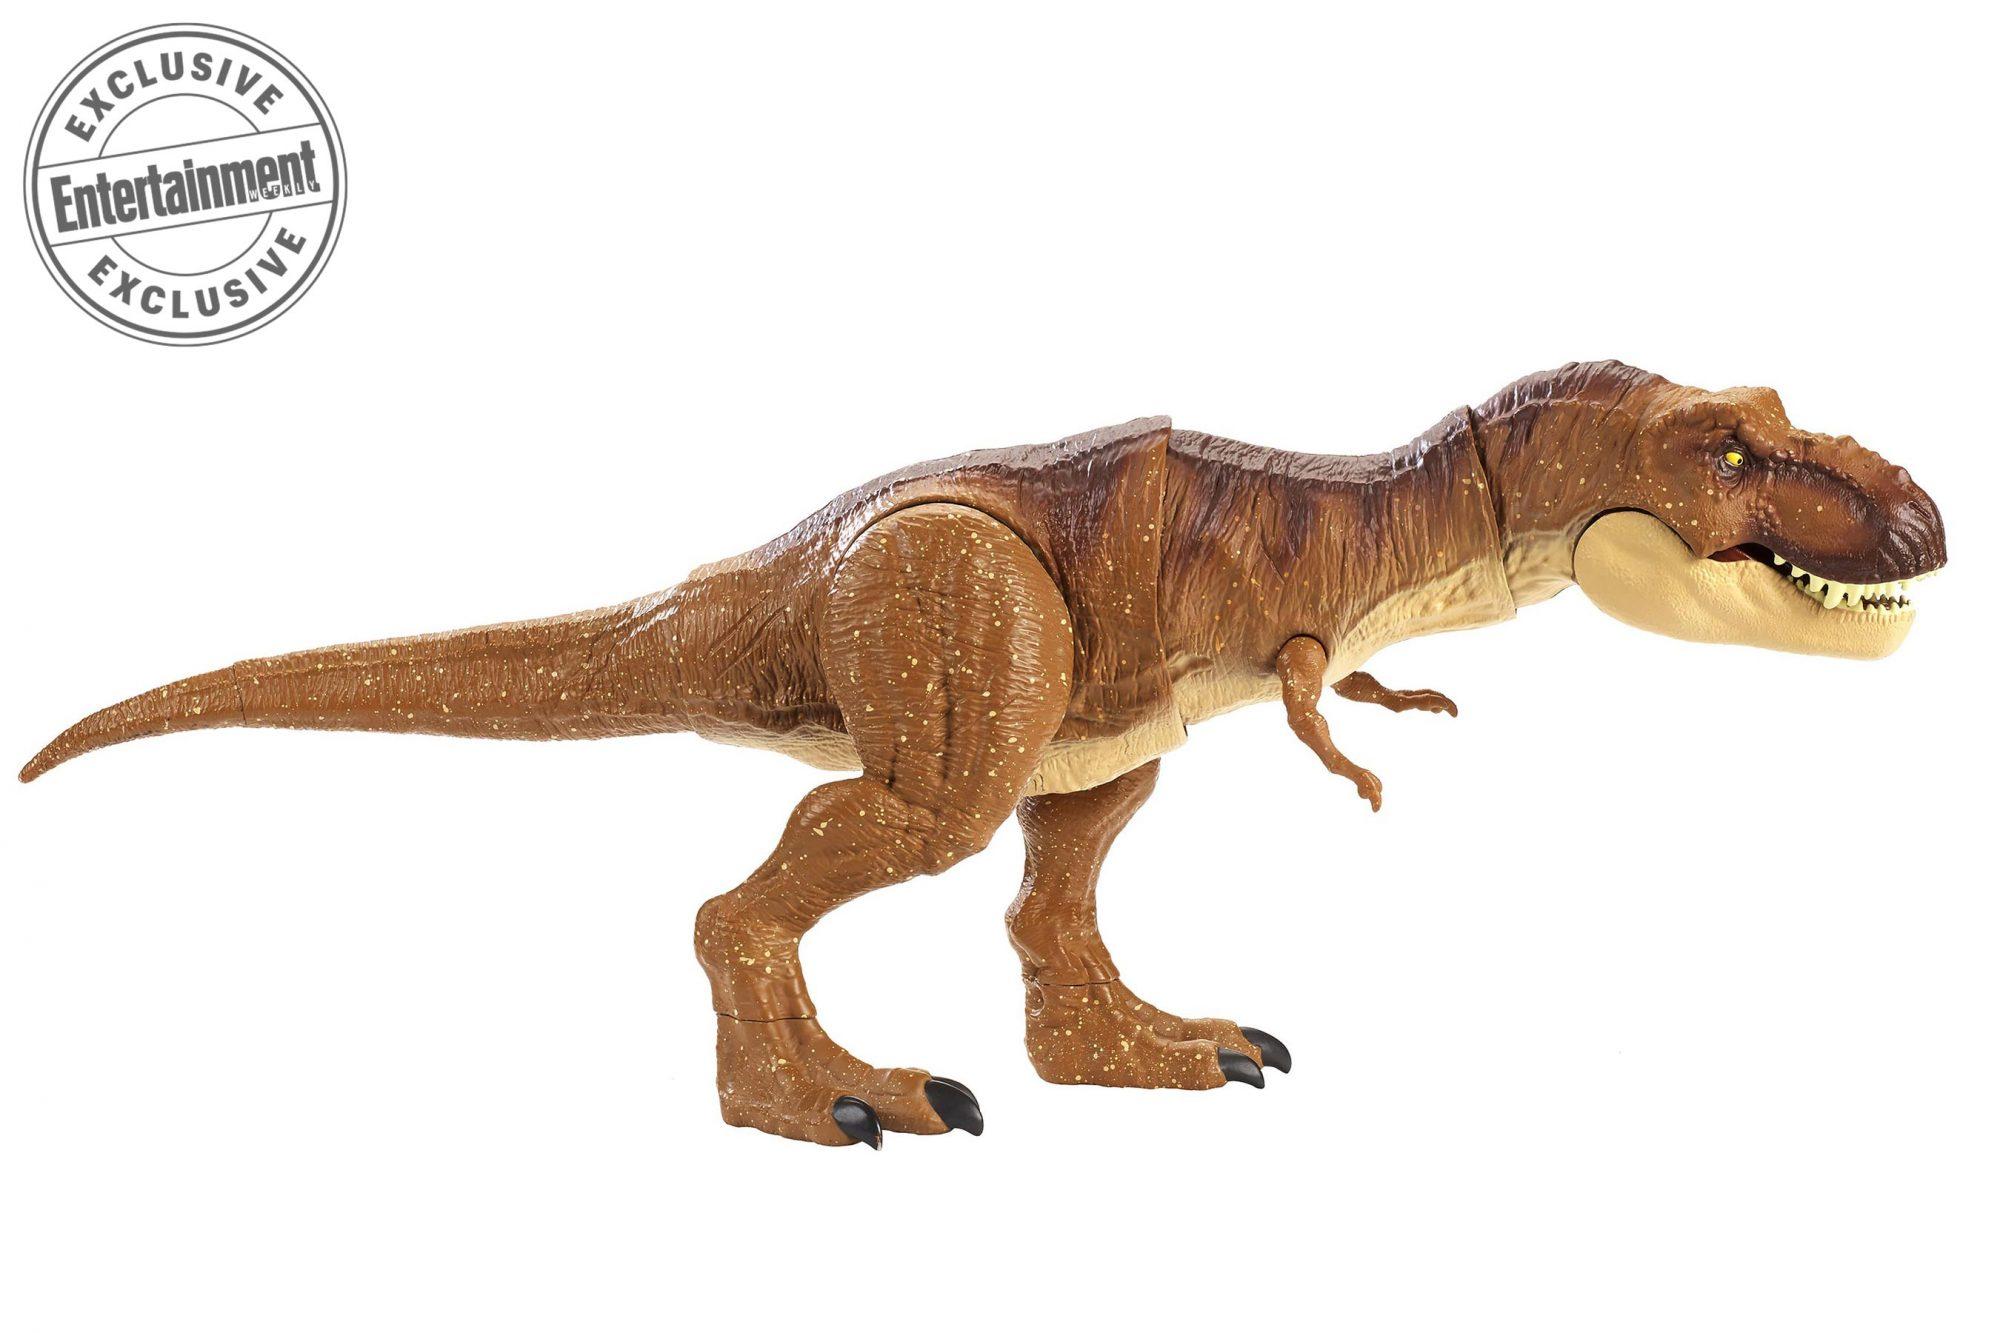 Jurassic-World-Toys-8